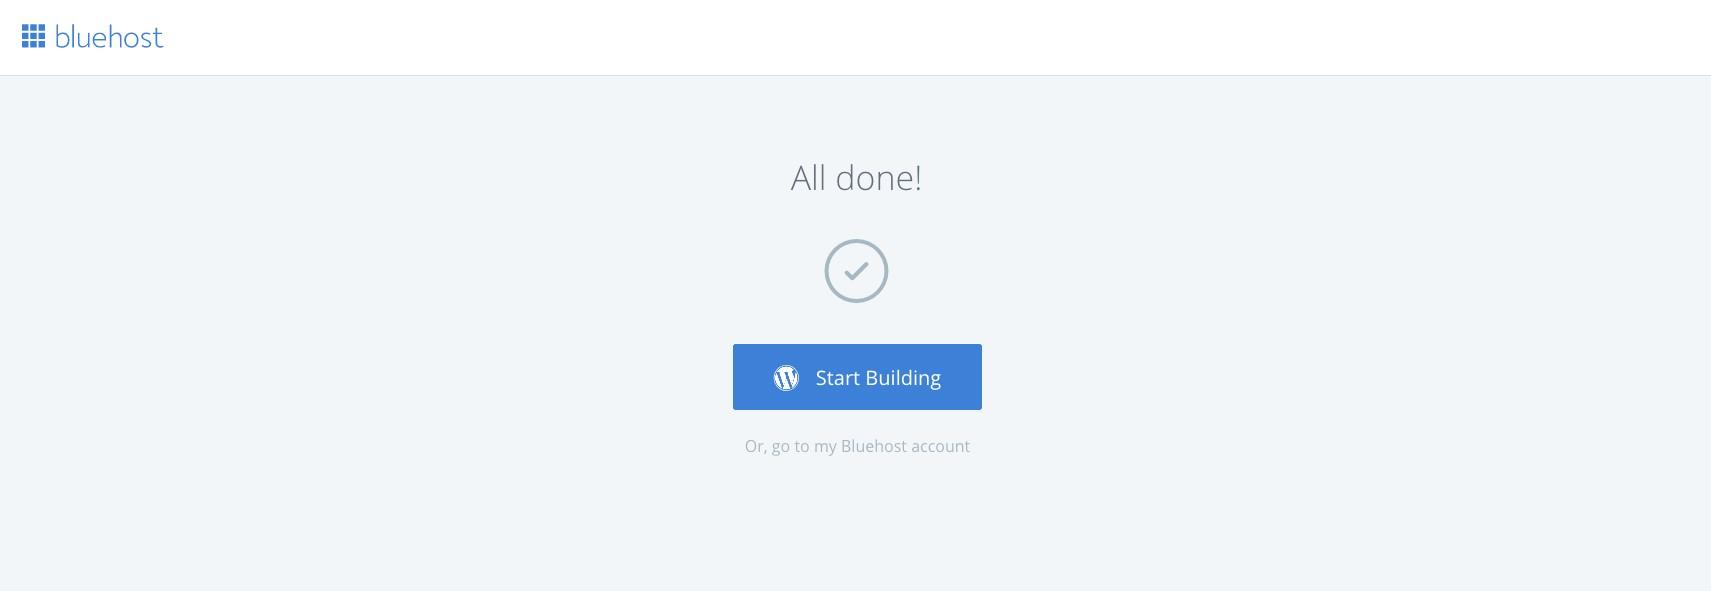 bluehost-start-building